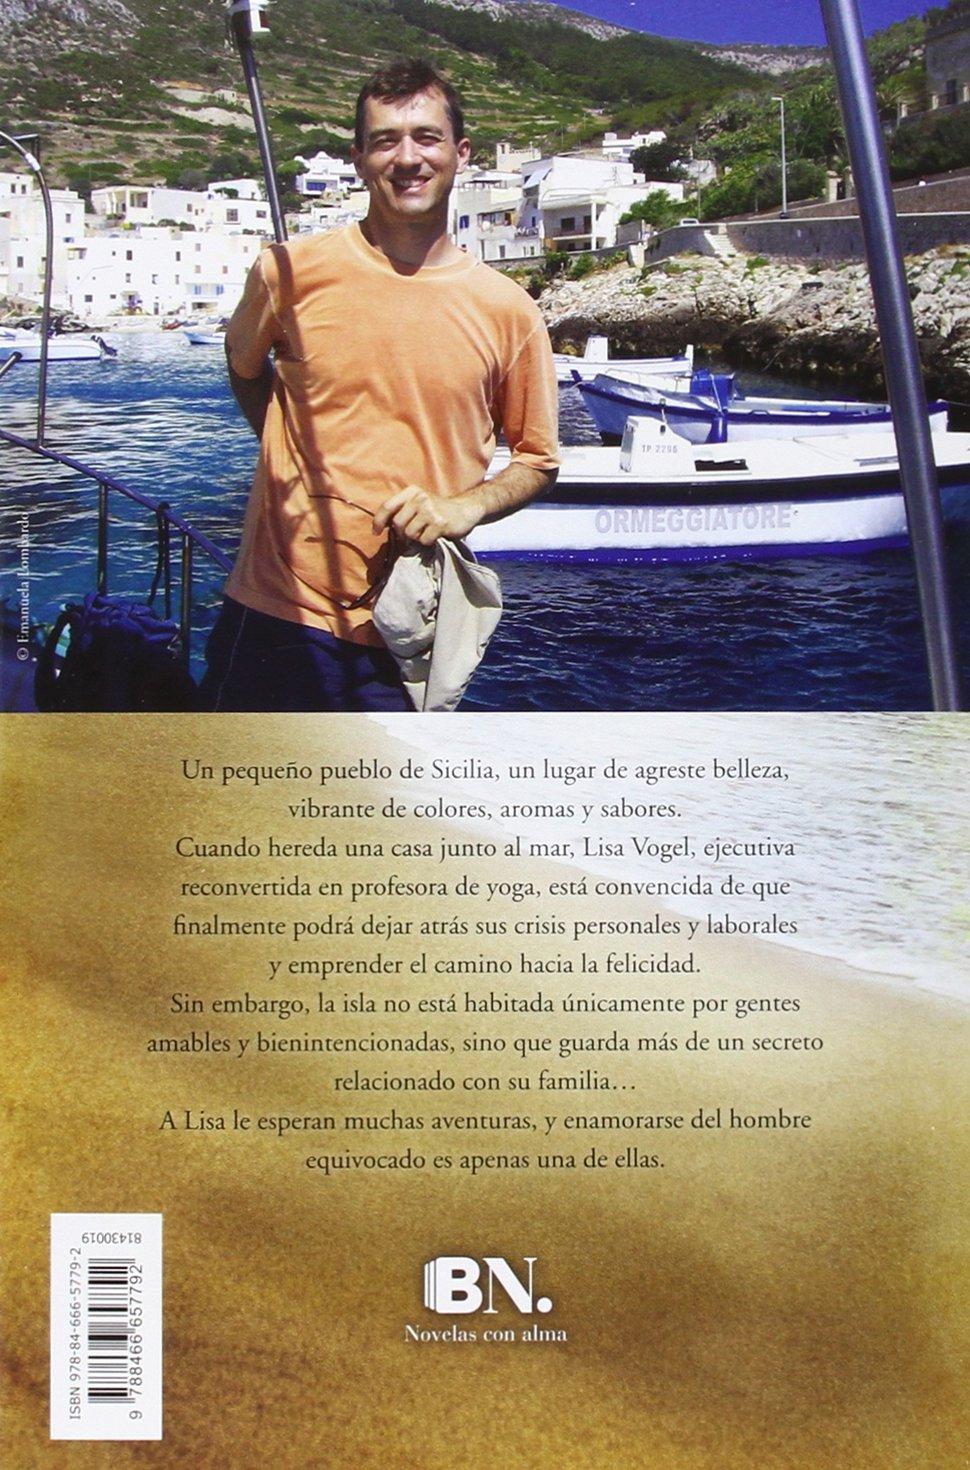 Yoga a la siciliana (Grandes novelas): Amazon.es: Eduardo ...